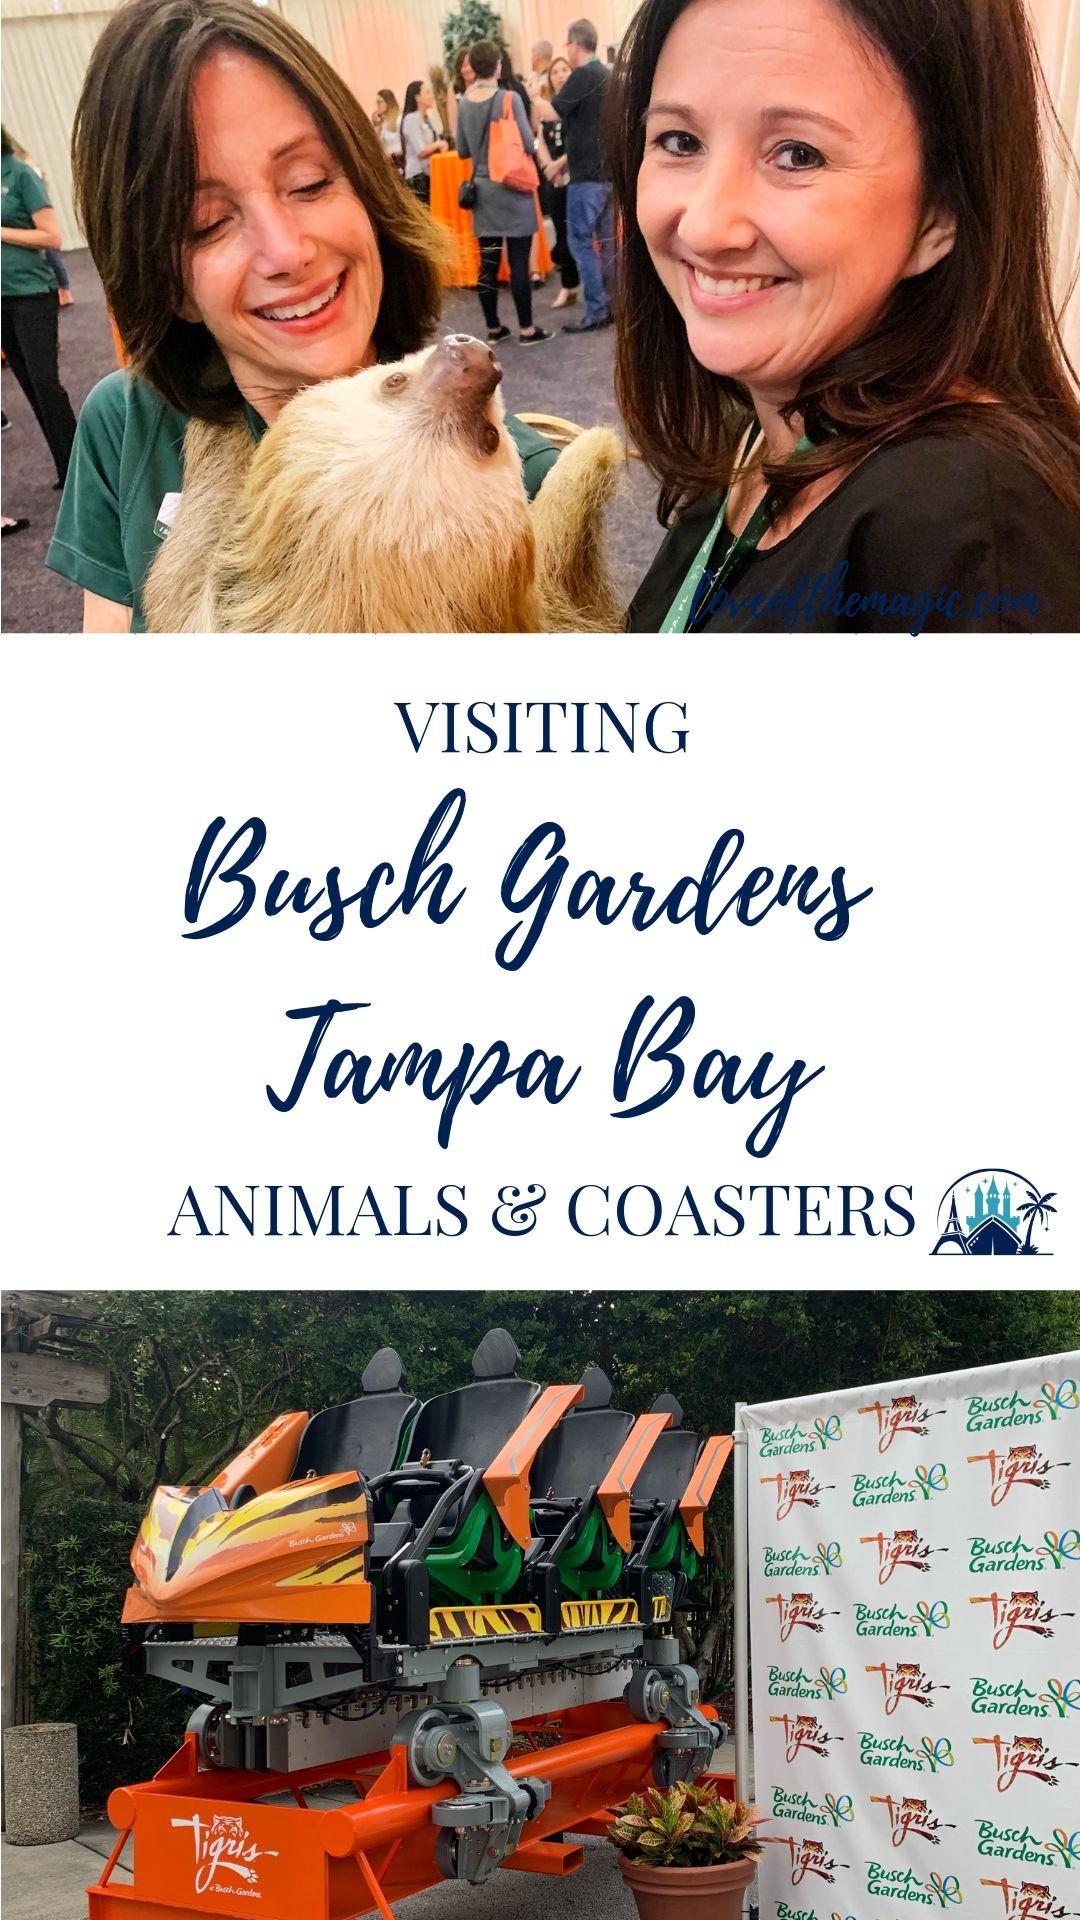 ca26b35fbf63531eafc9c8527a149ccf - Busch Gardens Tampa Bay All Day Dining Deal